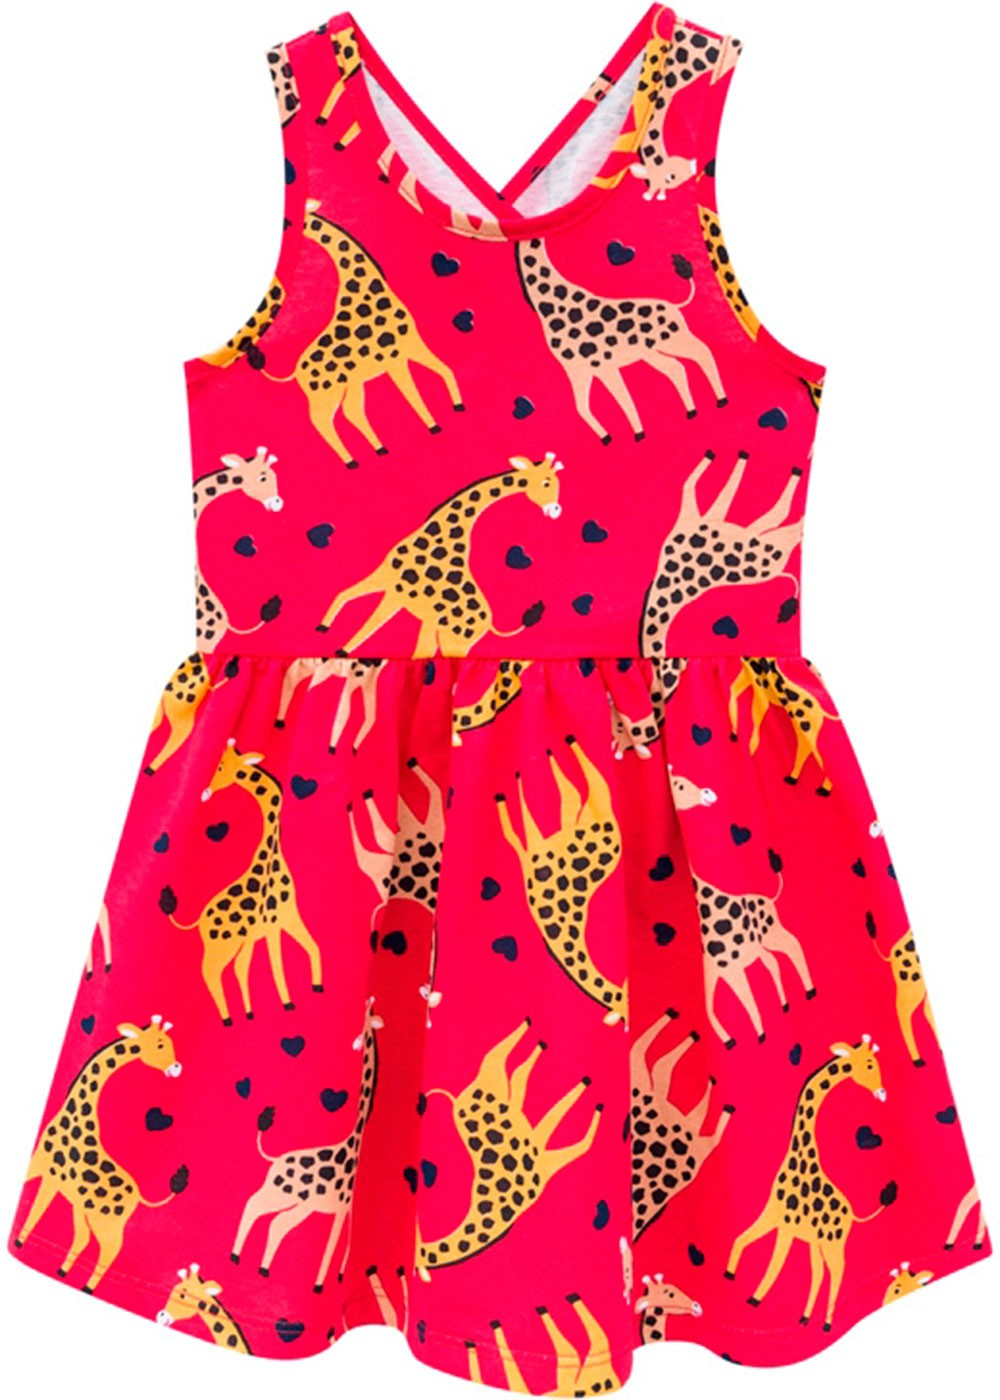 Vestido Infantil Vermelho Estampa Girafa - Kyly